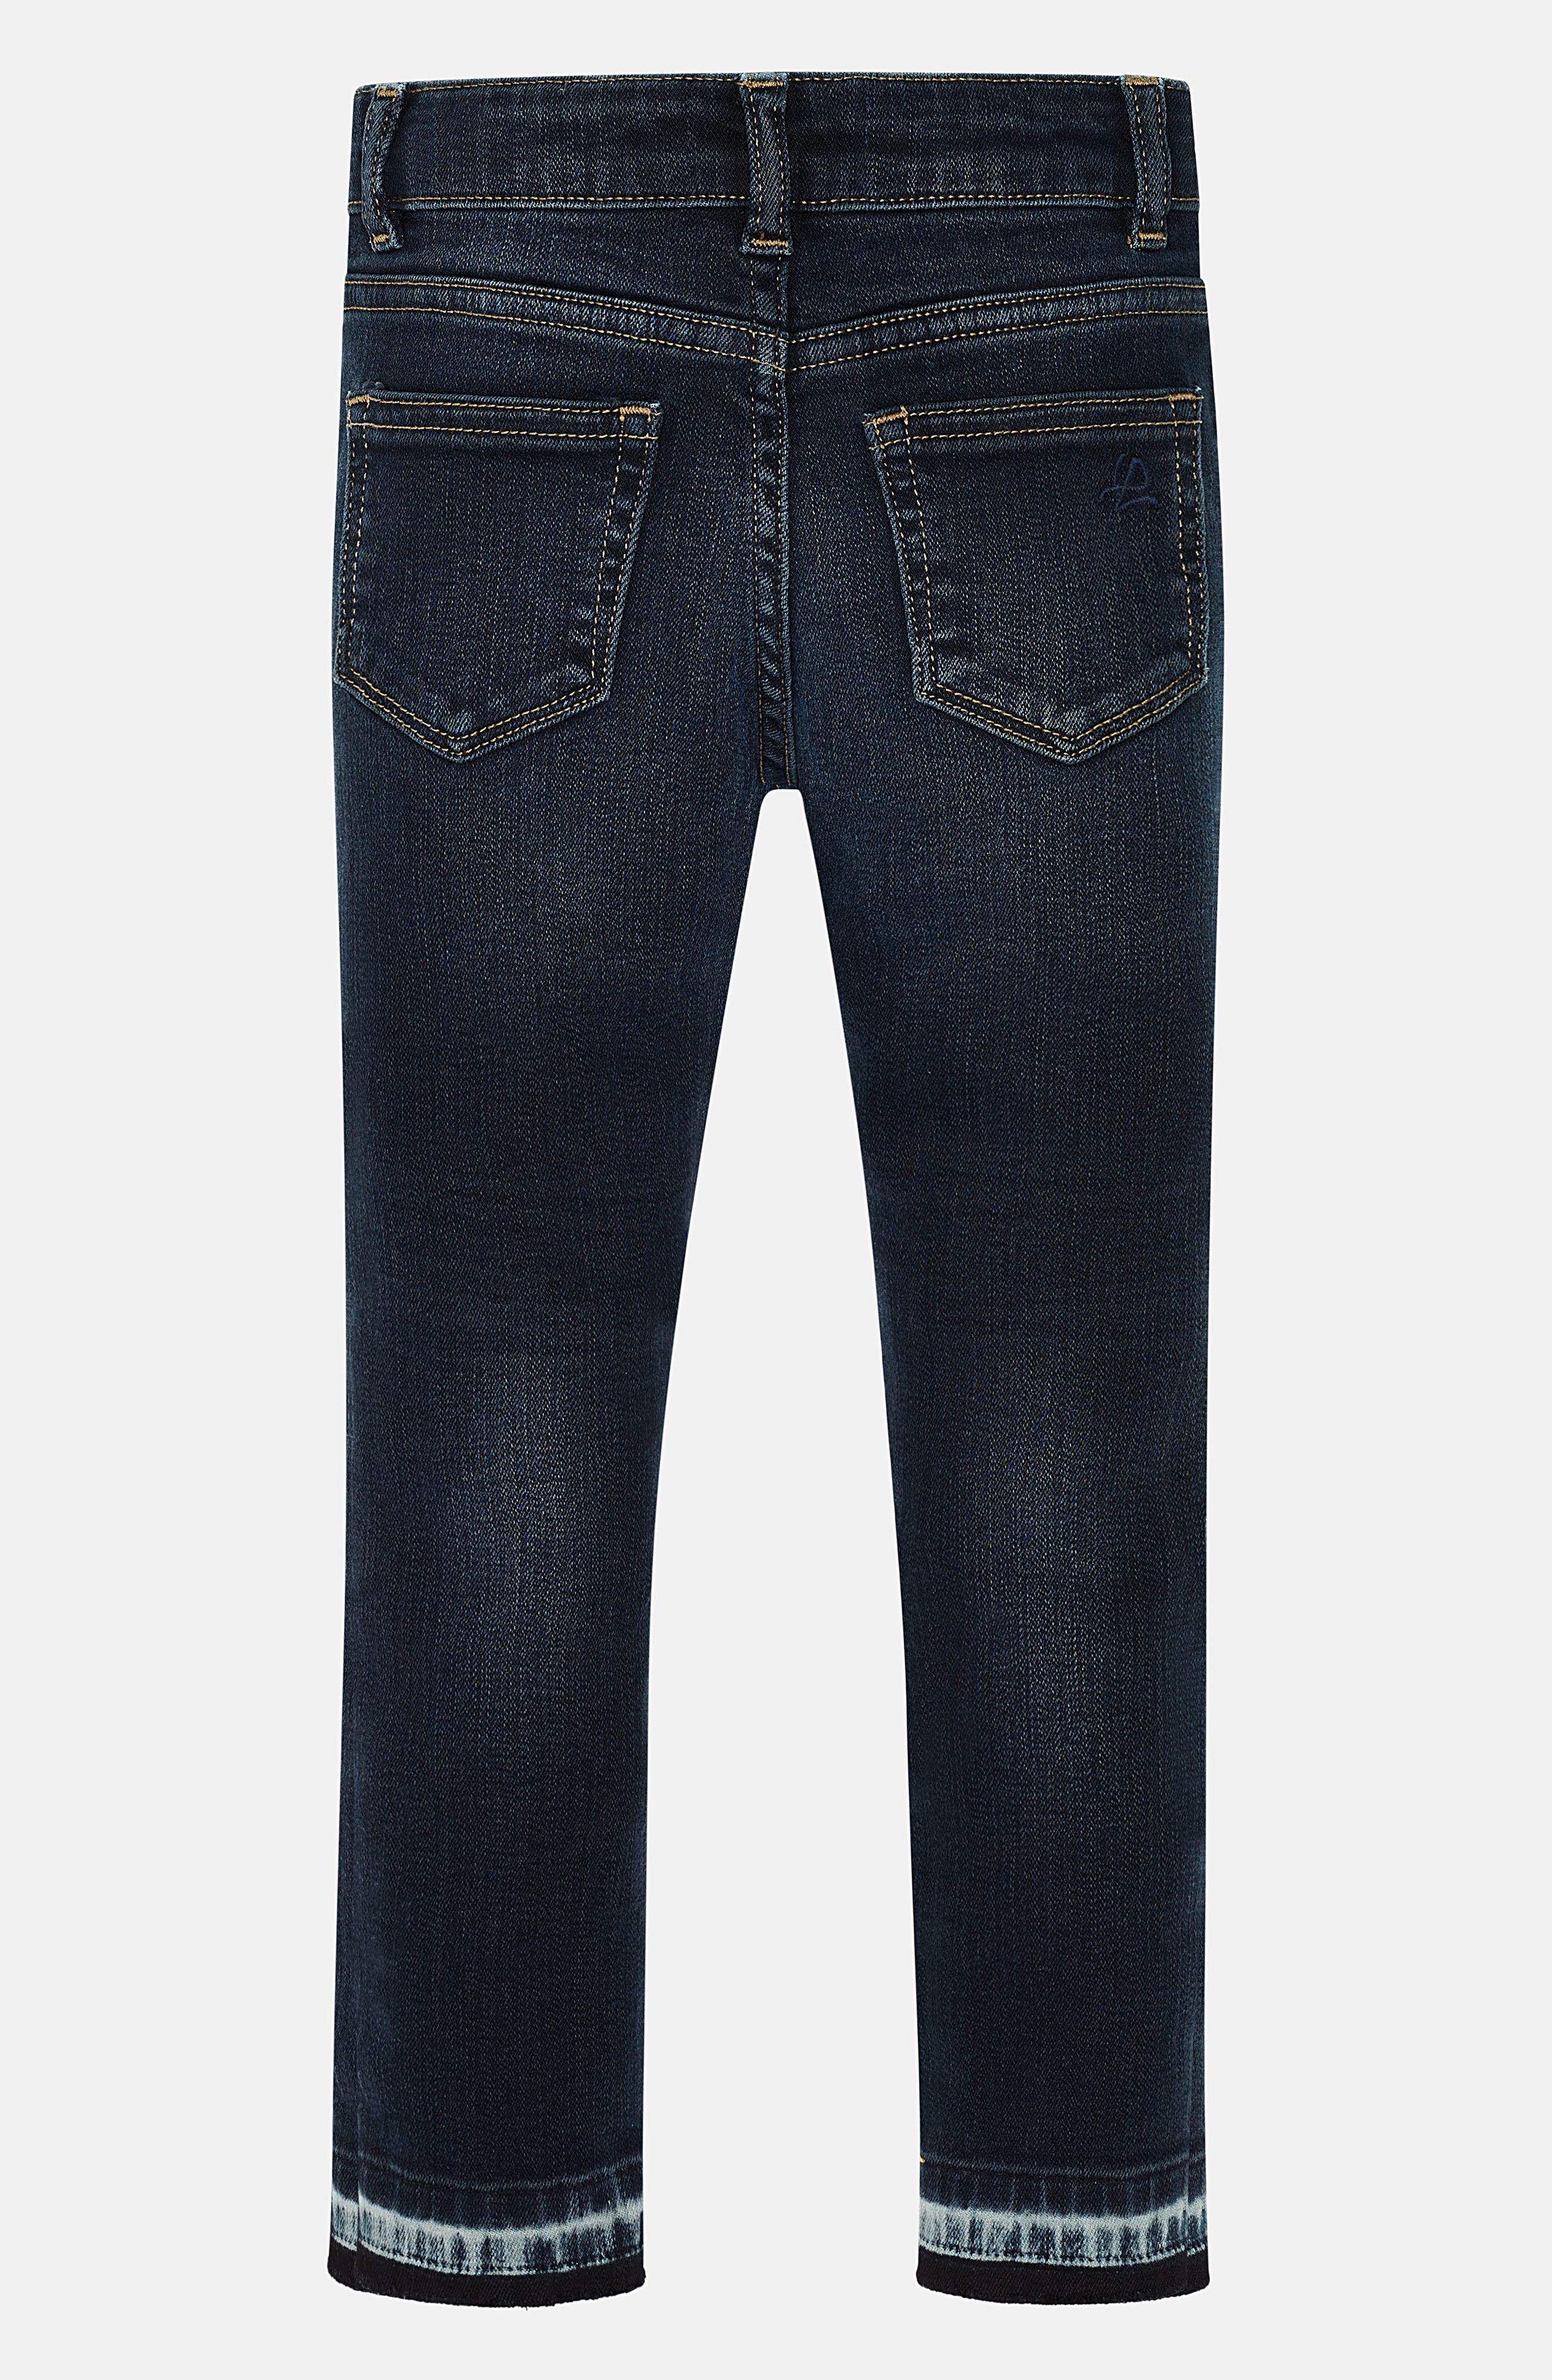 Chloe Distressed Skinny Jeans,                             Alternate thumbnail 2, color,                             401